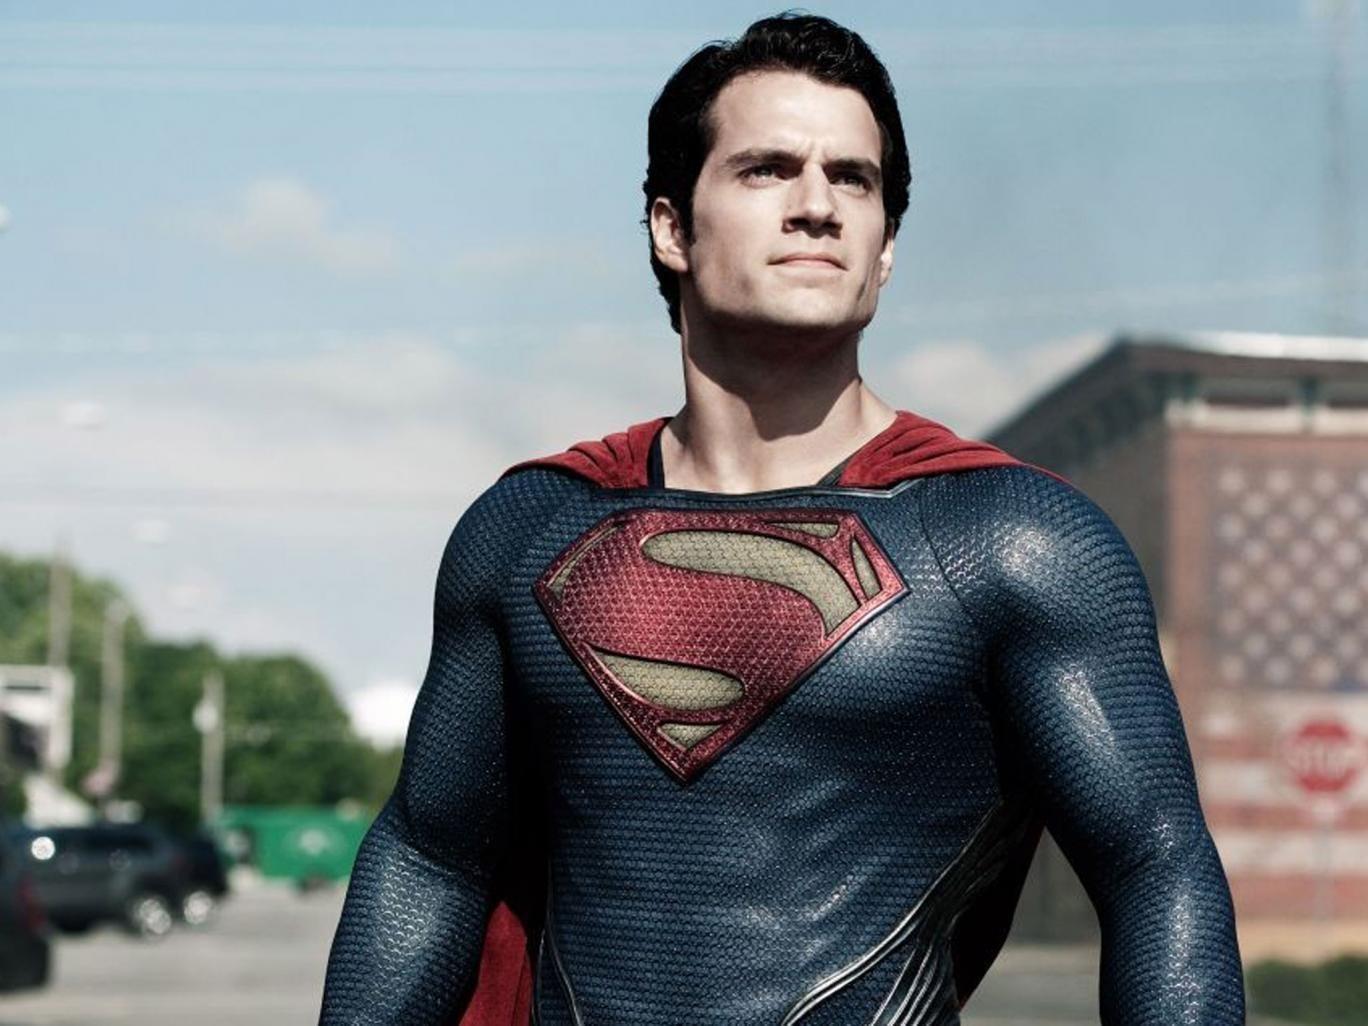 The Clark knight: Henry Cavill stars as Superman in Zack Snyder's superhero adventure 'Man of Steel'